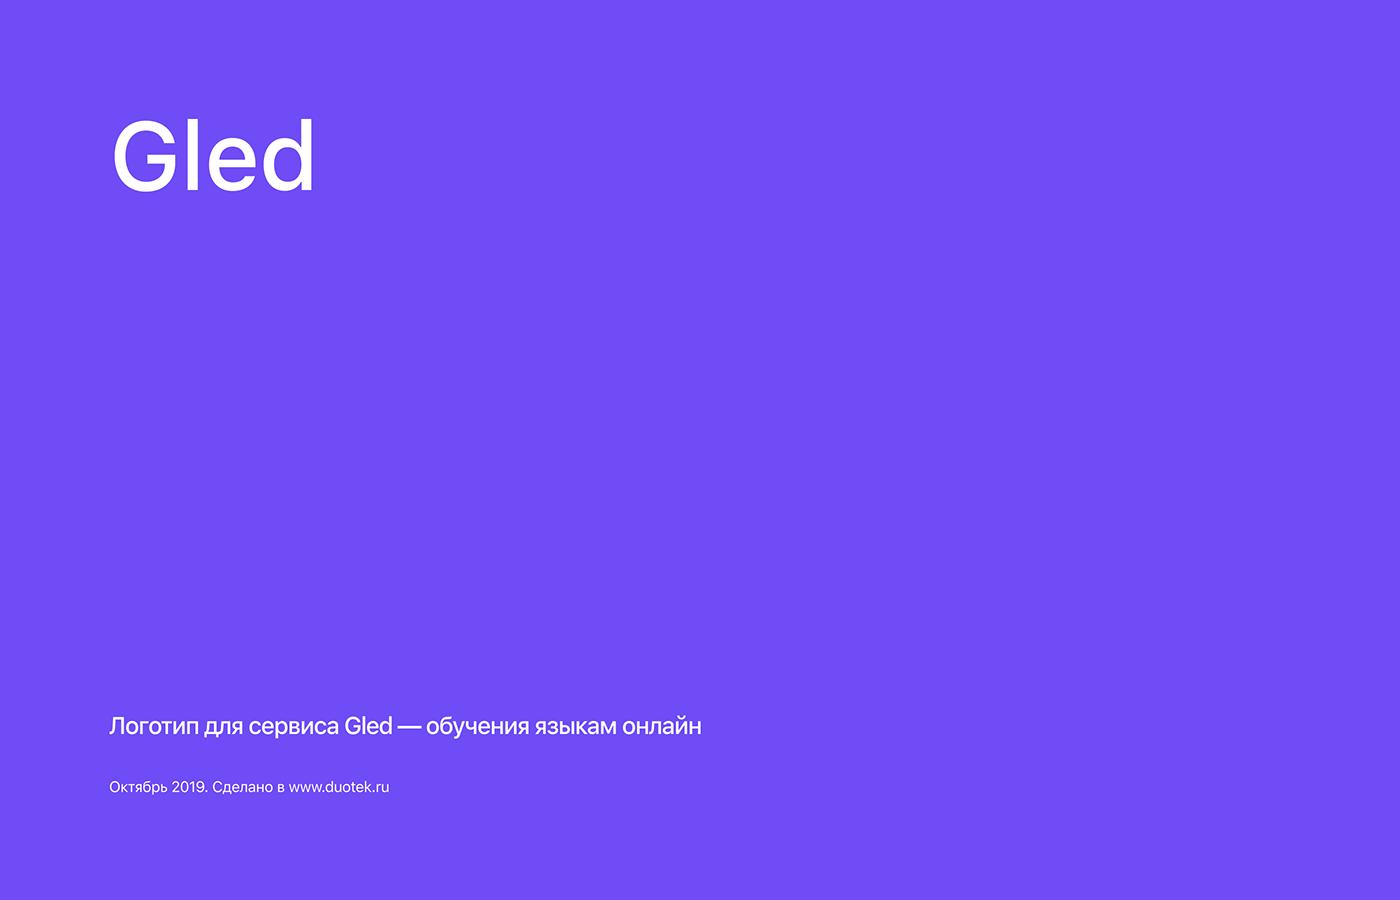 Image may contain: screenshot and purple